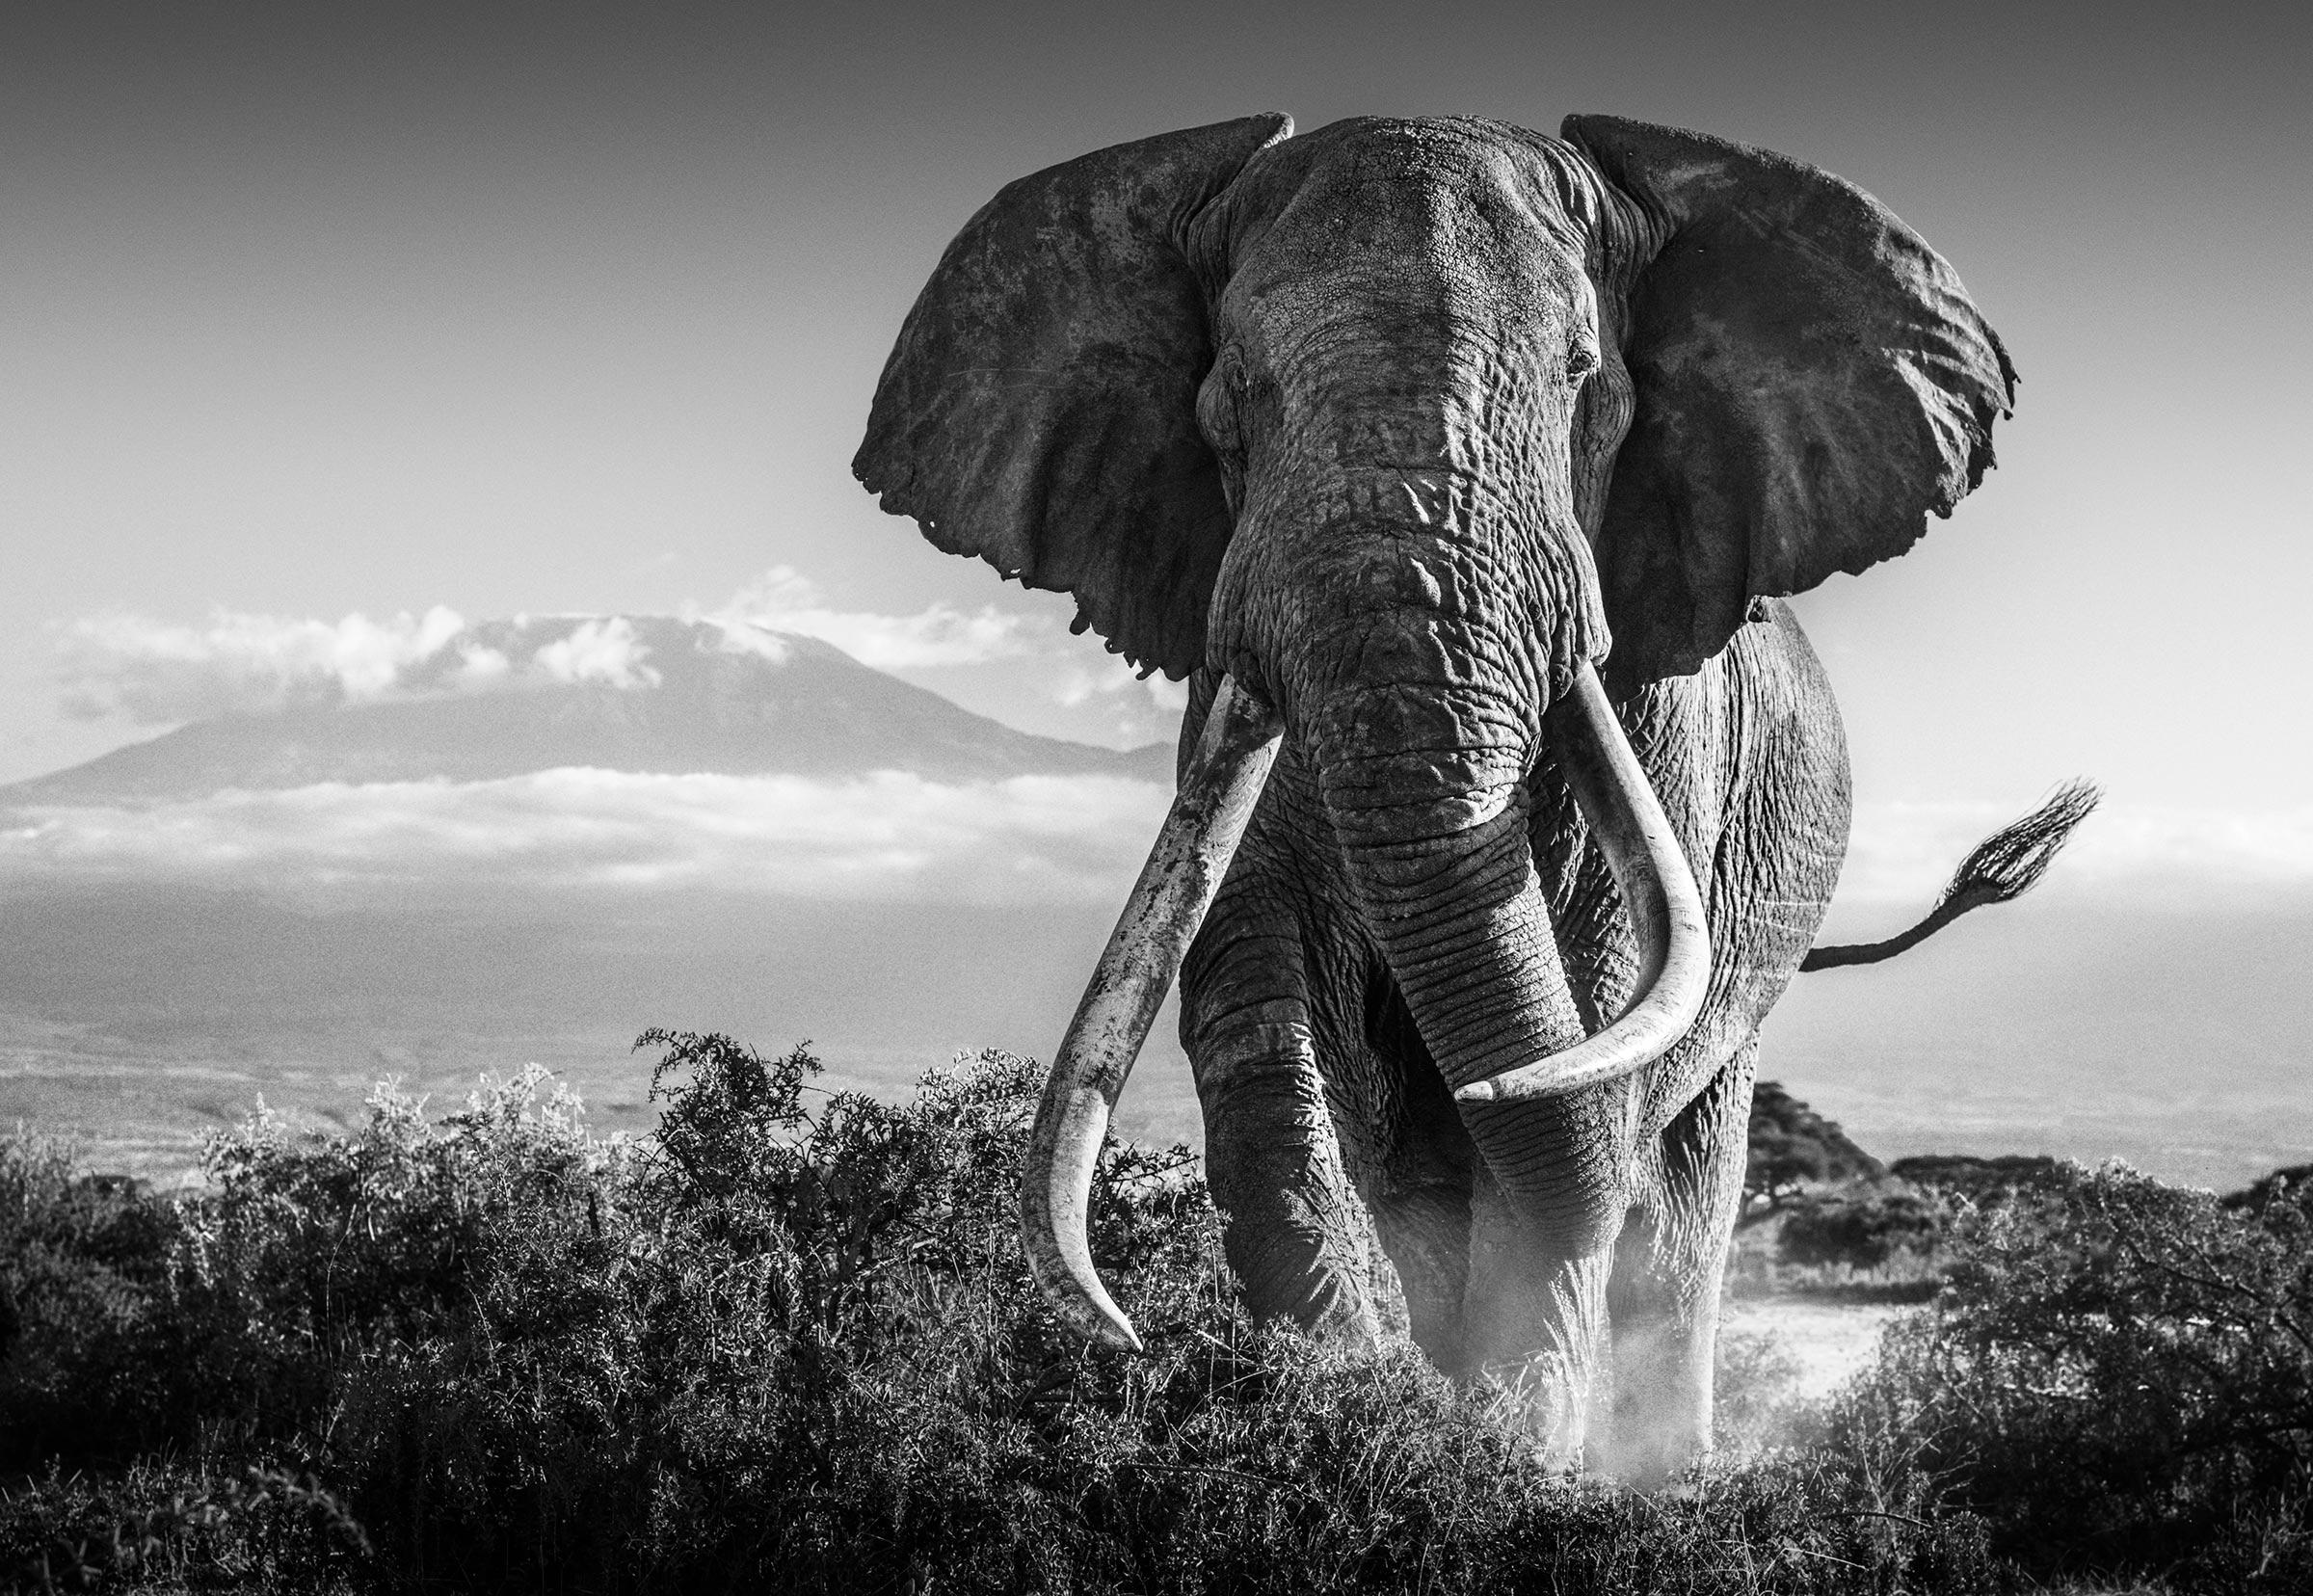 Afrika - David Yarrow - Leonhard's Gallery